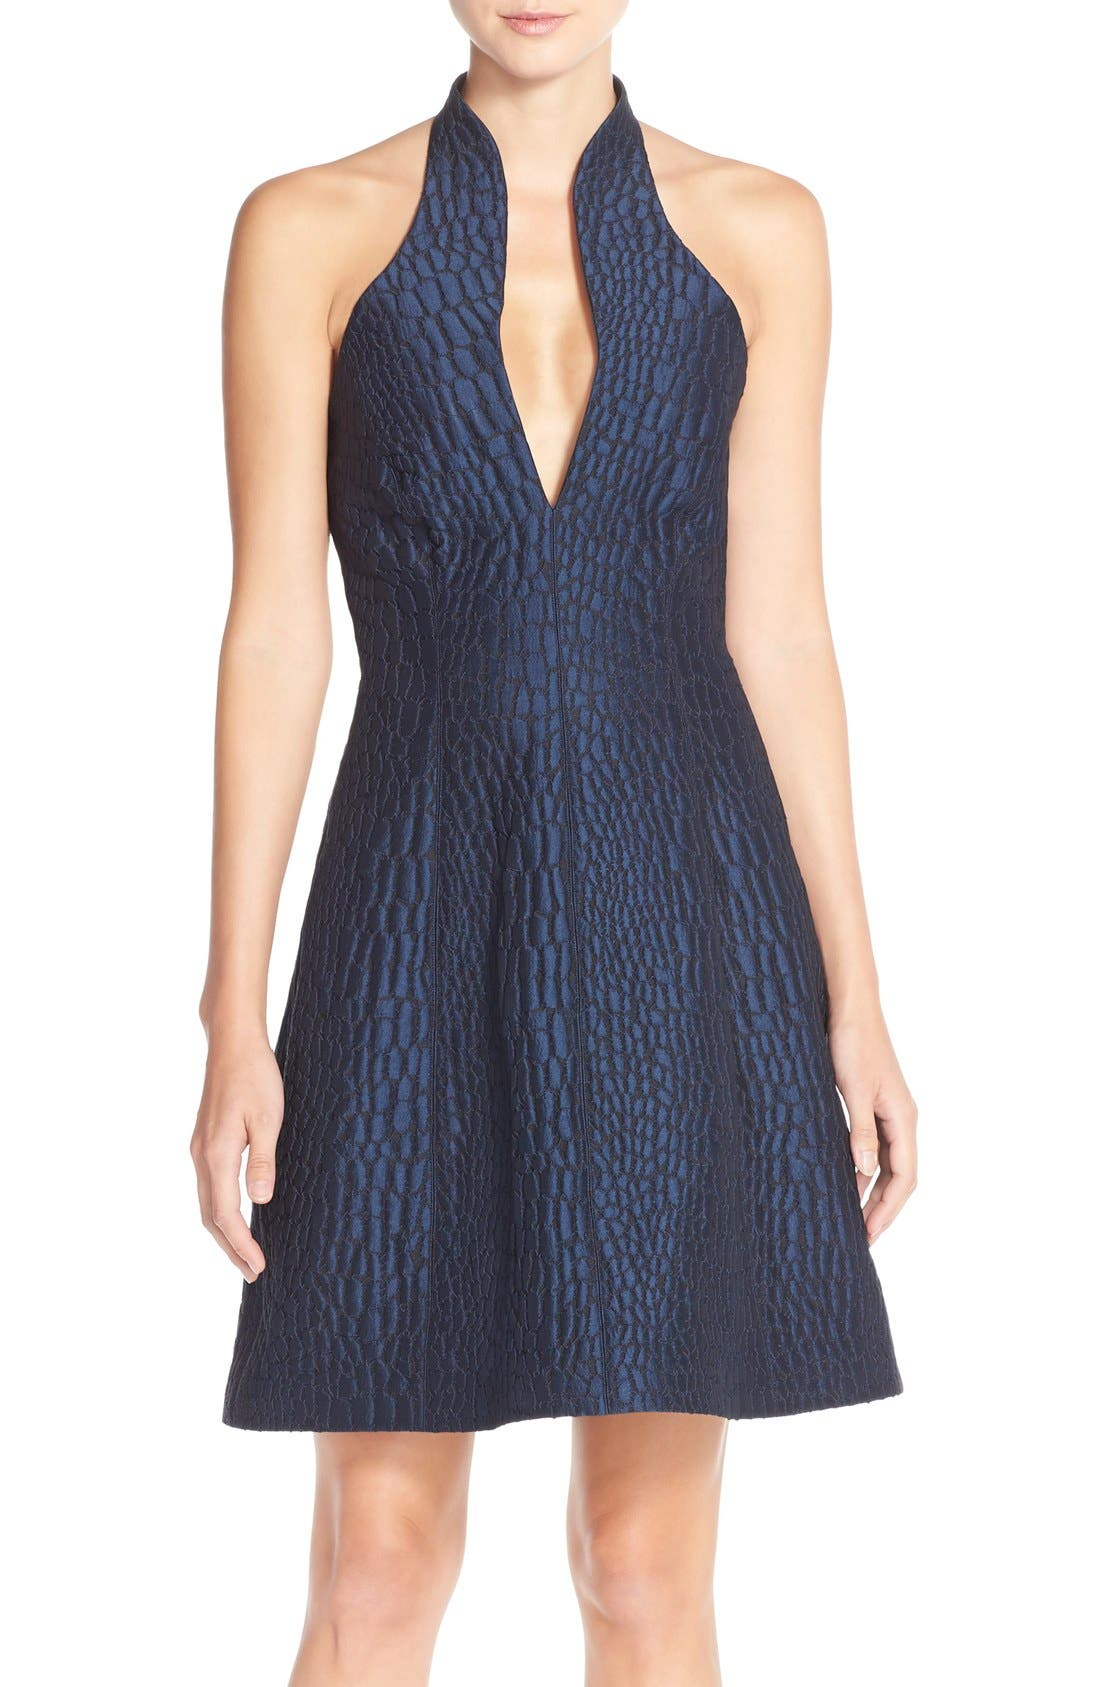 Alternate Image 1 Selected - Halston Heritage Halter Jacquard Fit & Flare Dress